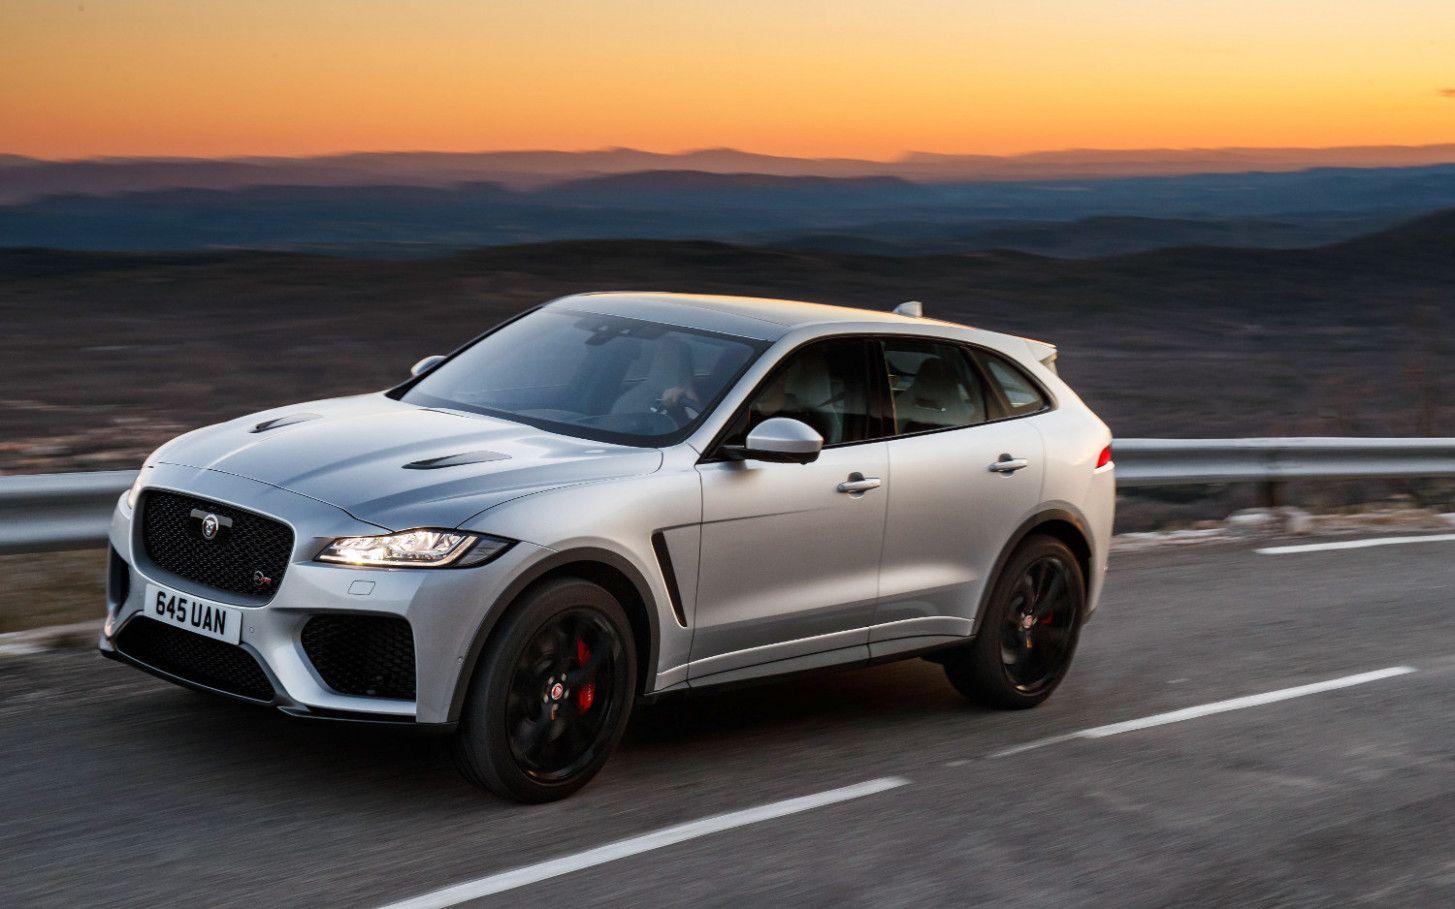 Jaguar Hybrid SUV 2020 Release Date And Concept Jaguar